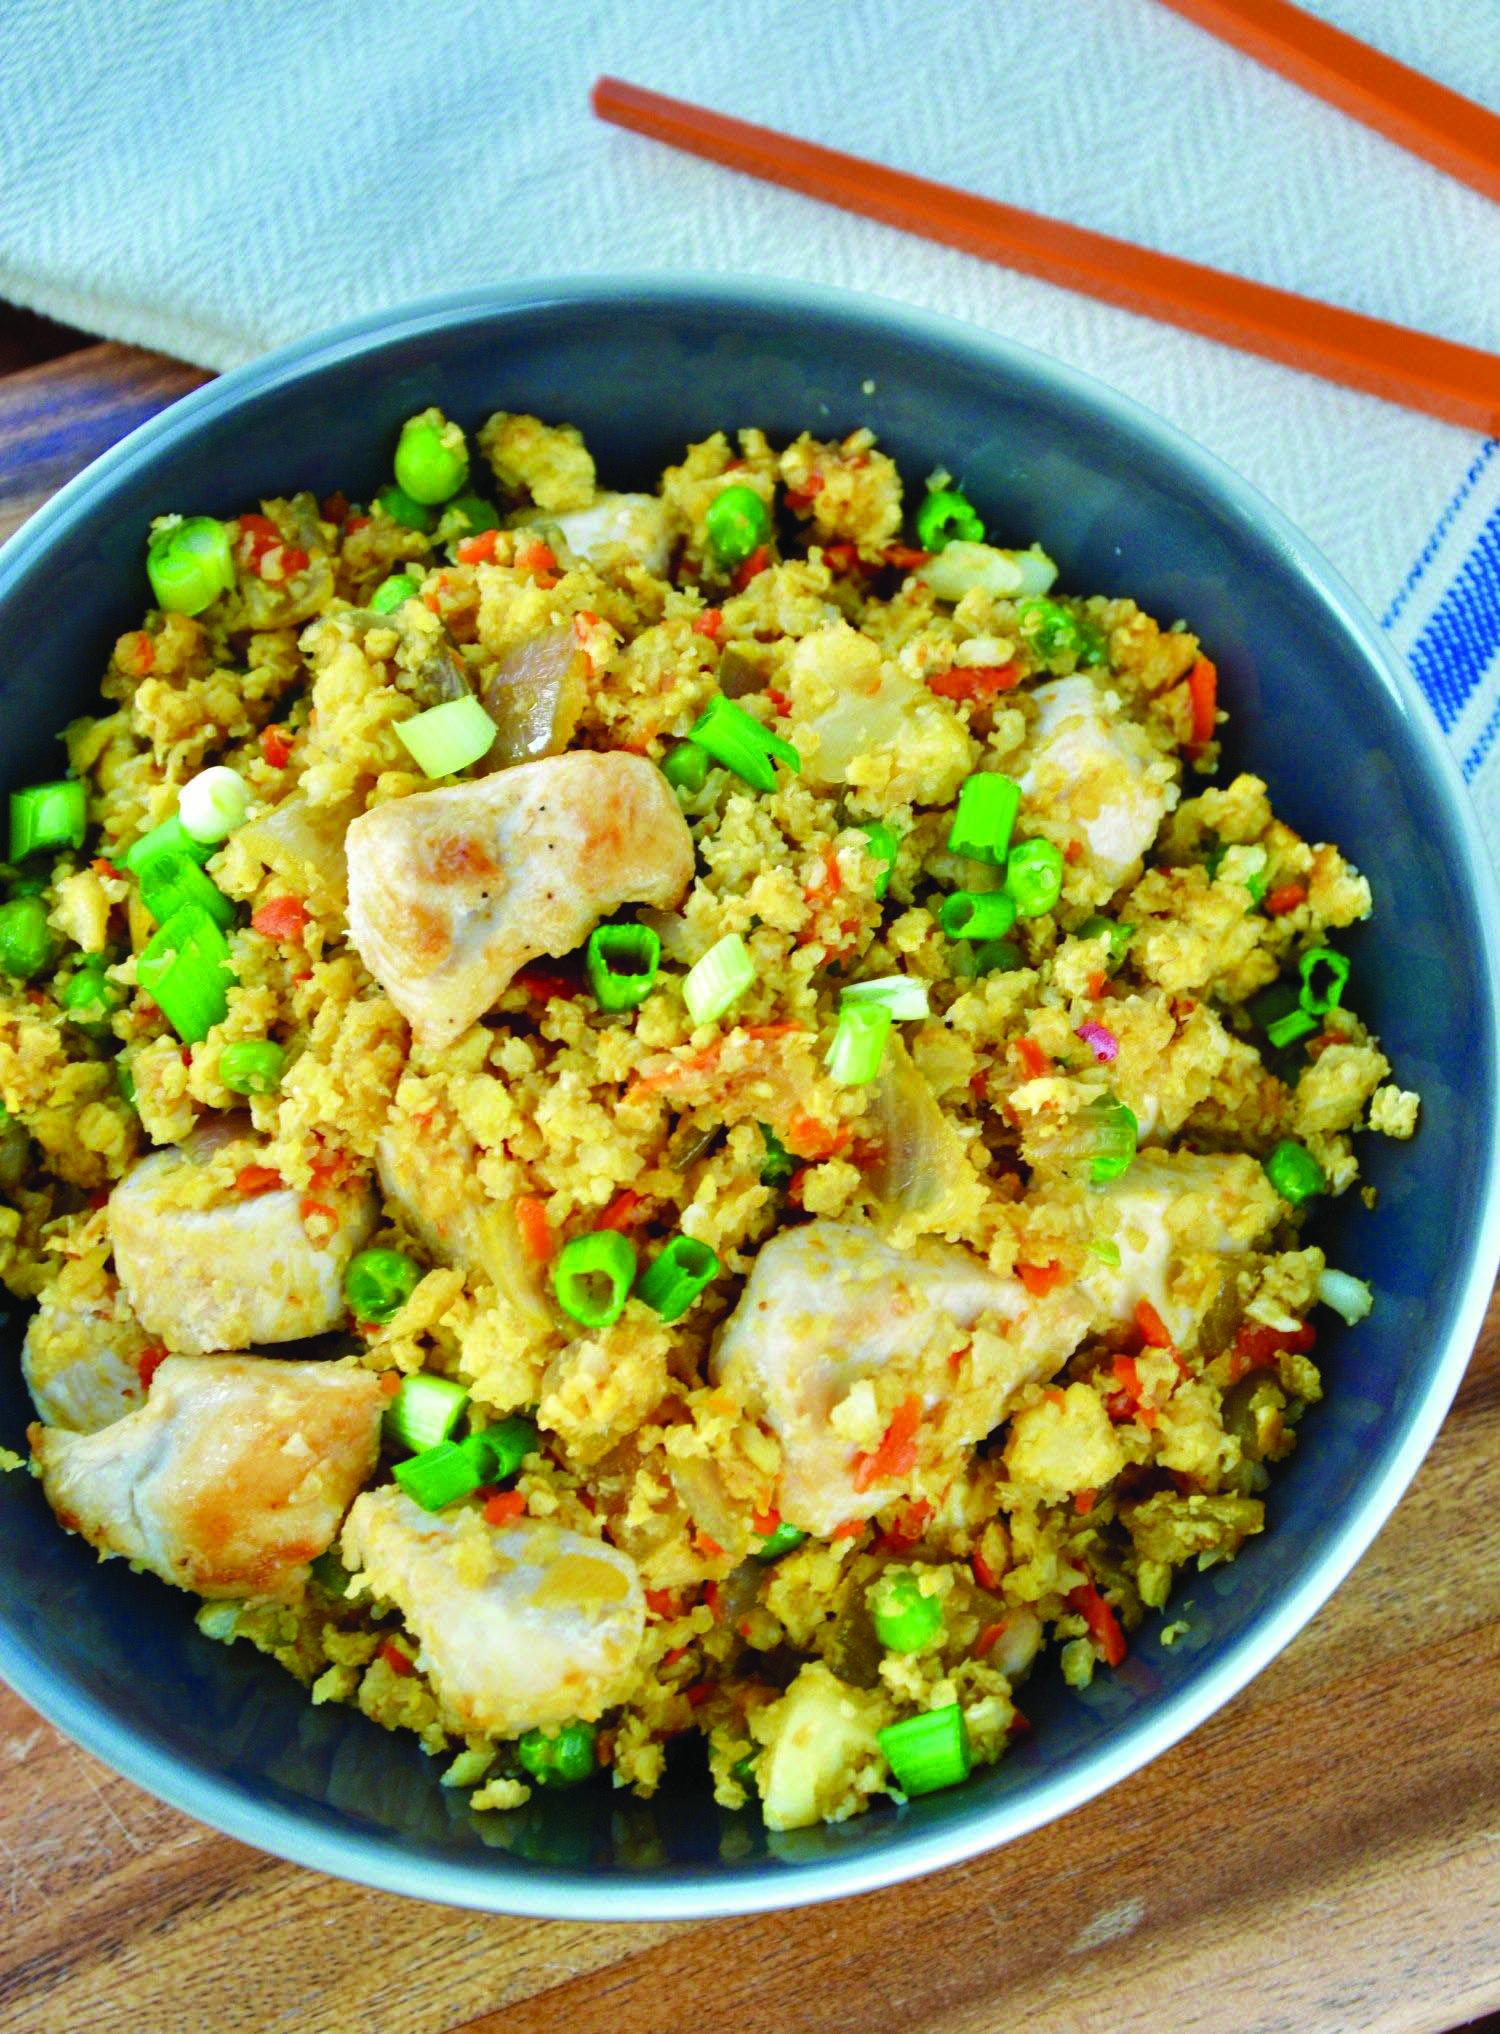 Sweet chicken cauliflower fried rice healthy just on i-healthy recipes ideas #cauliflowerfriedrice